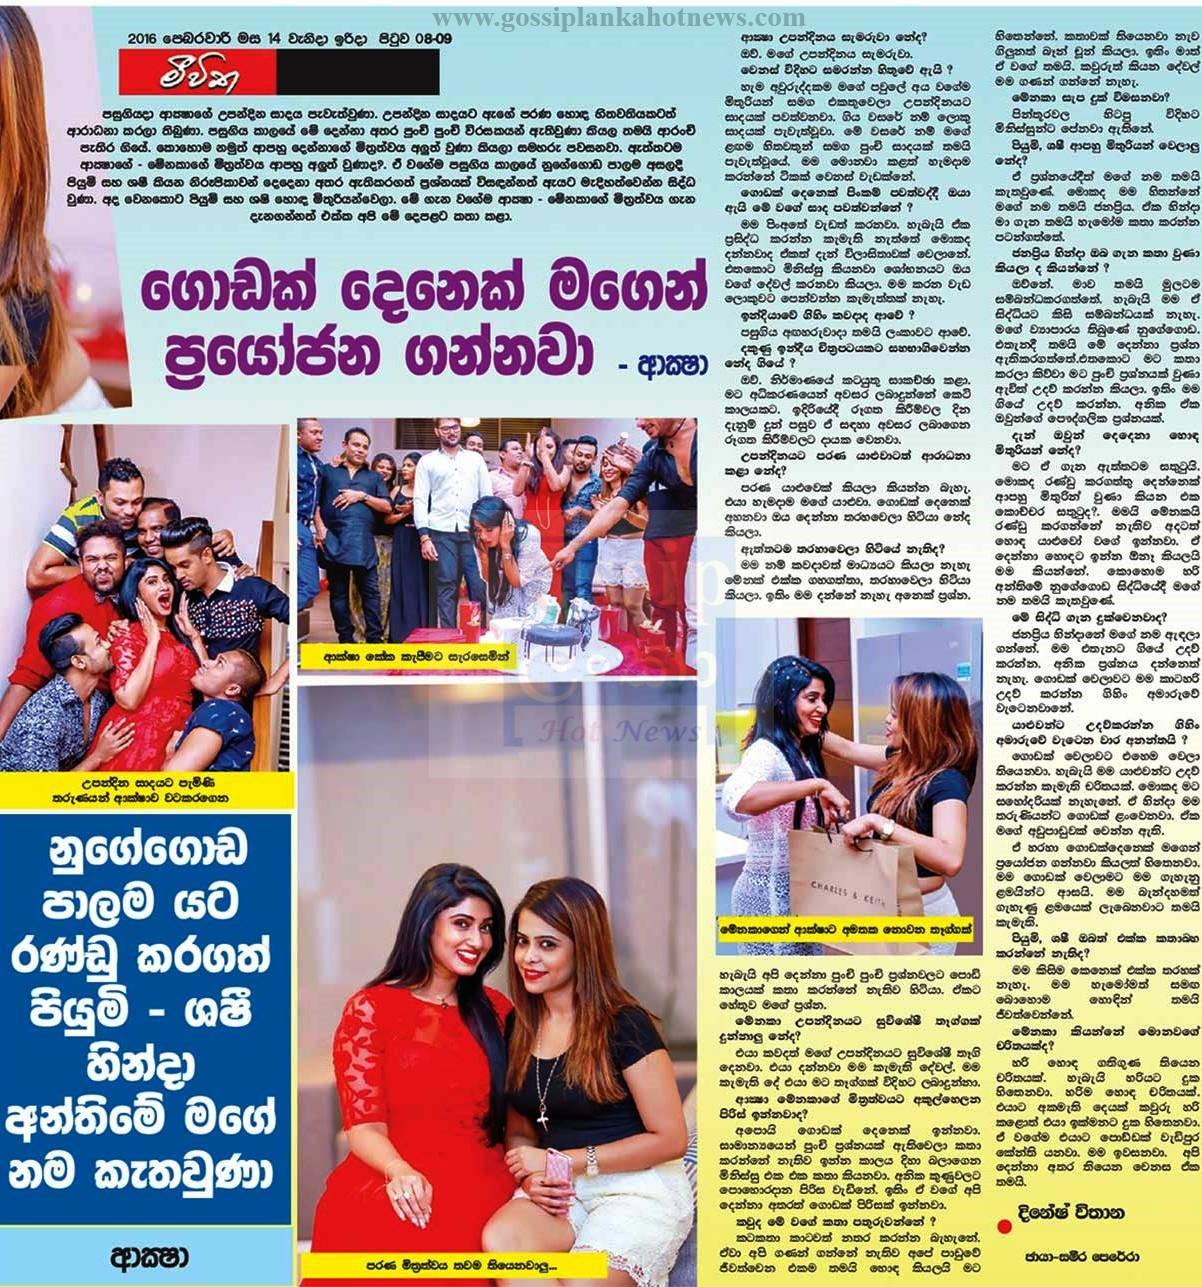 sri lanka news Newslk - the official government news portal of sri lanka.